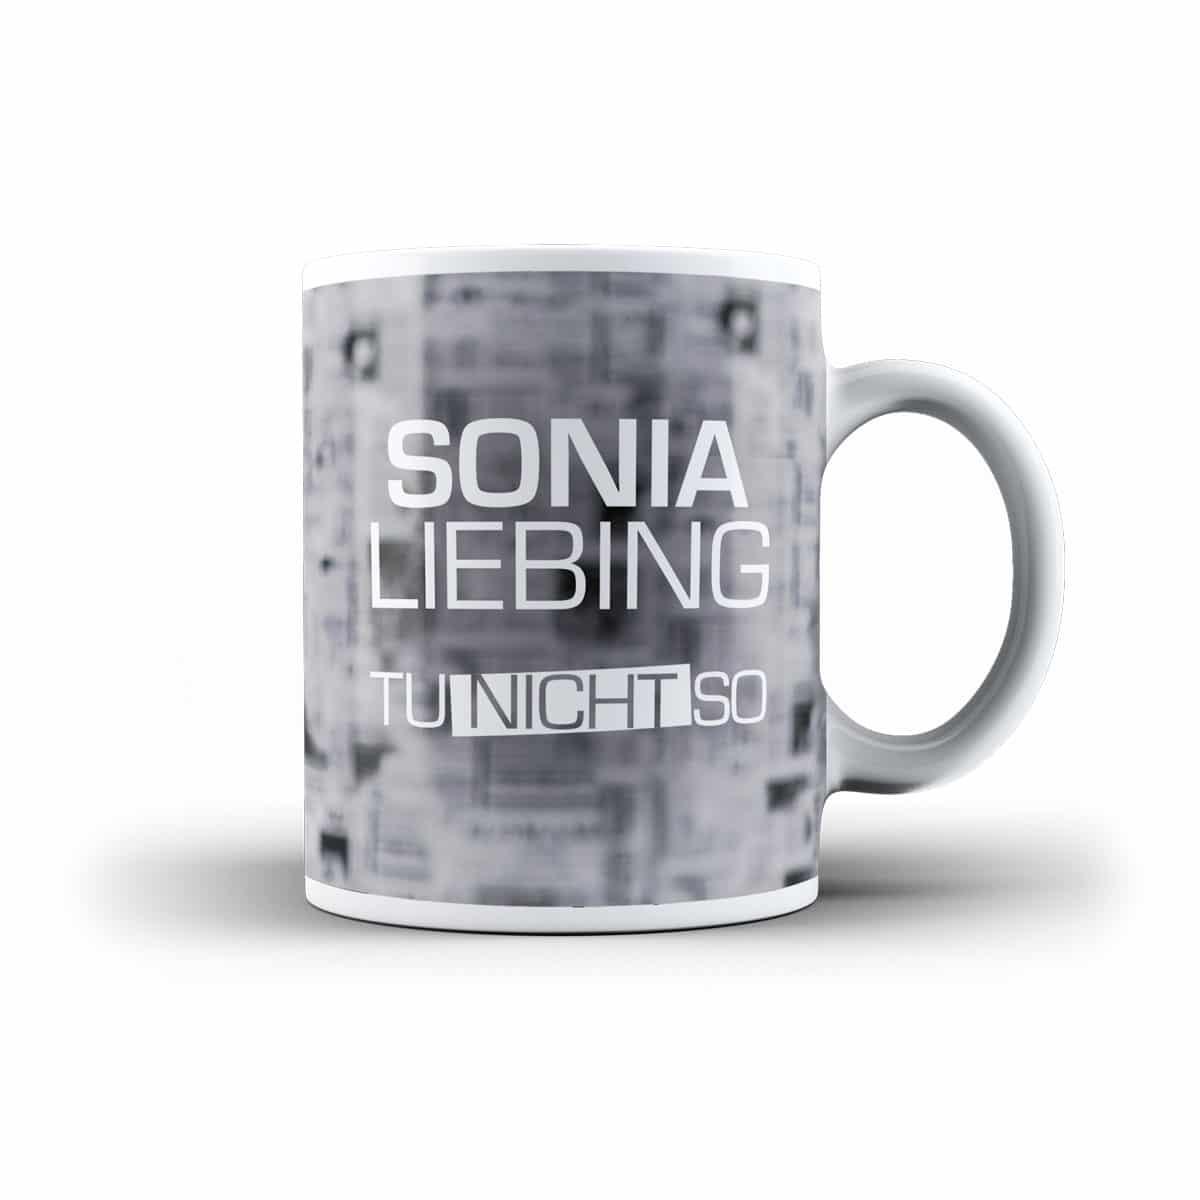 Sonia Liebing Fanartikel Tasse